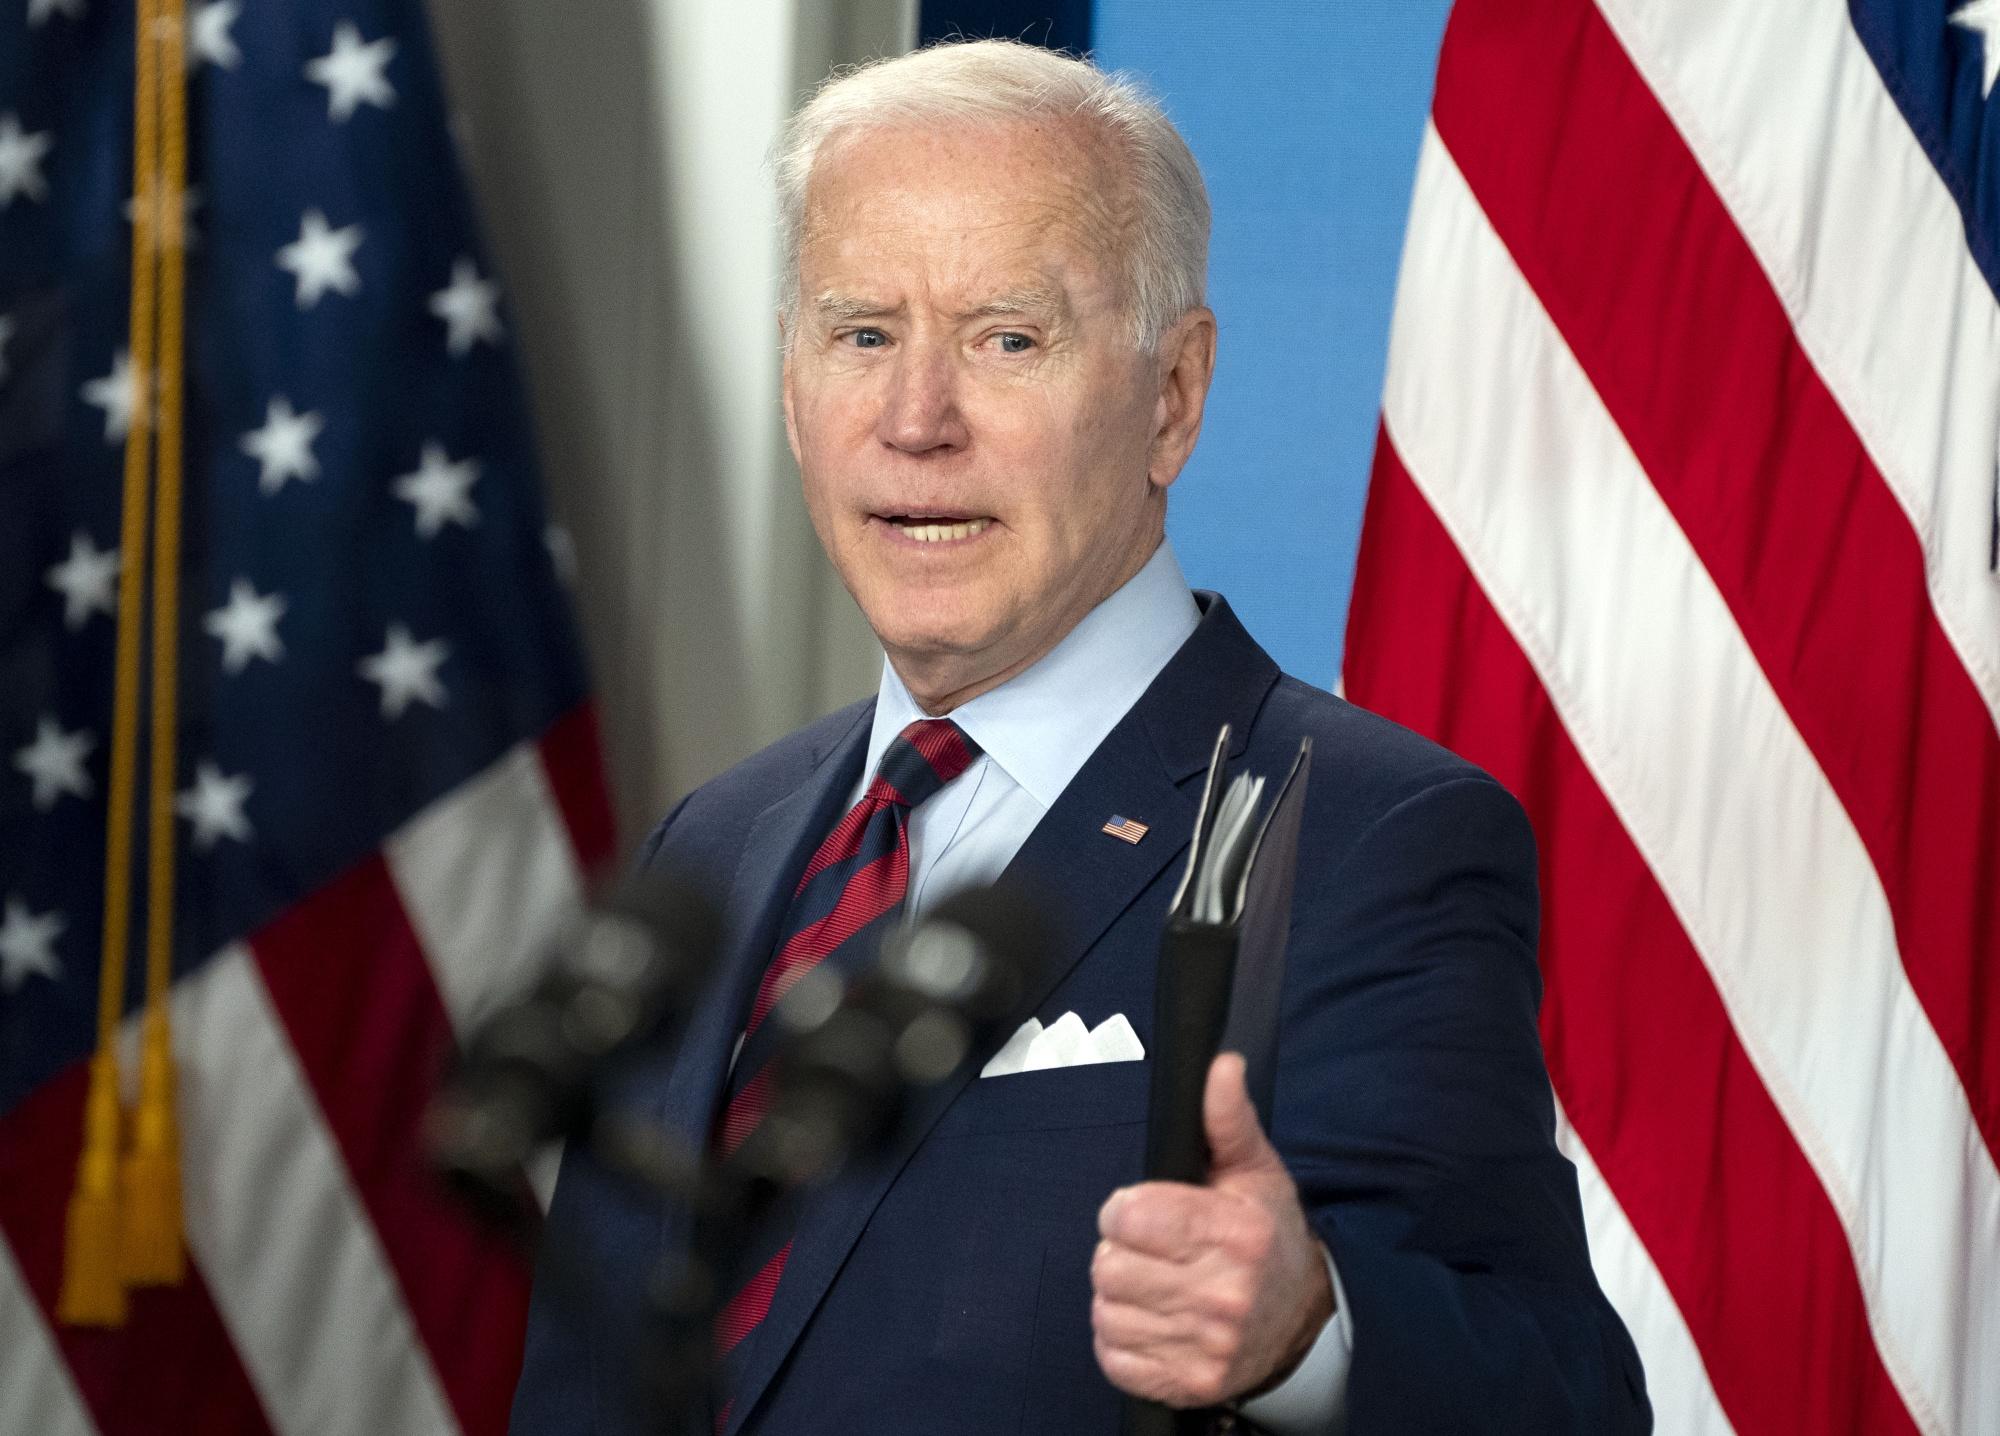 President Joe Biden speaksin Washington, D.C.,onApril 7.